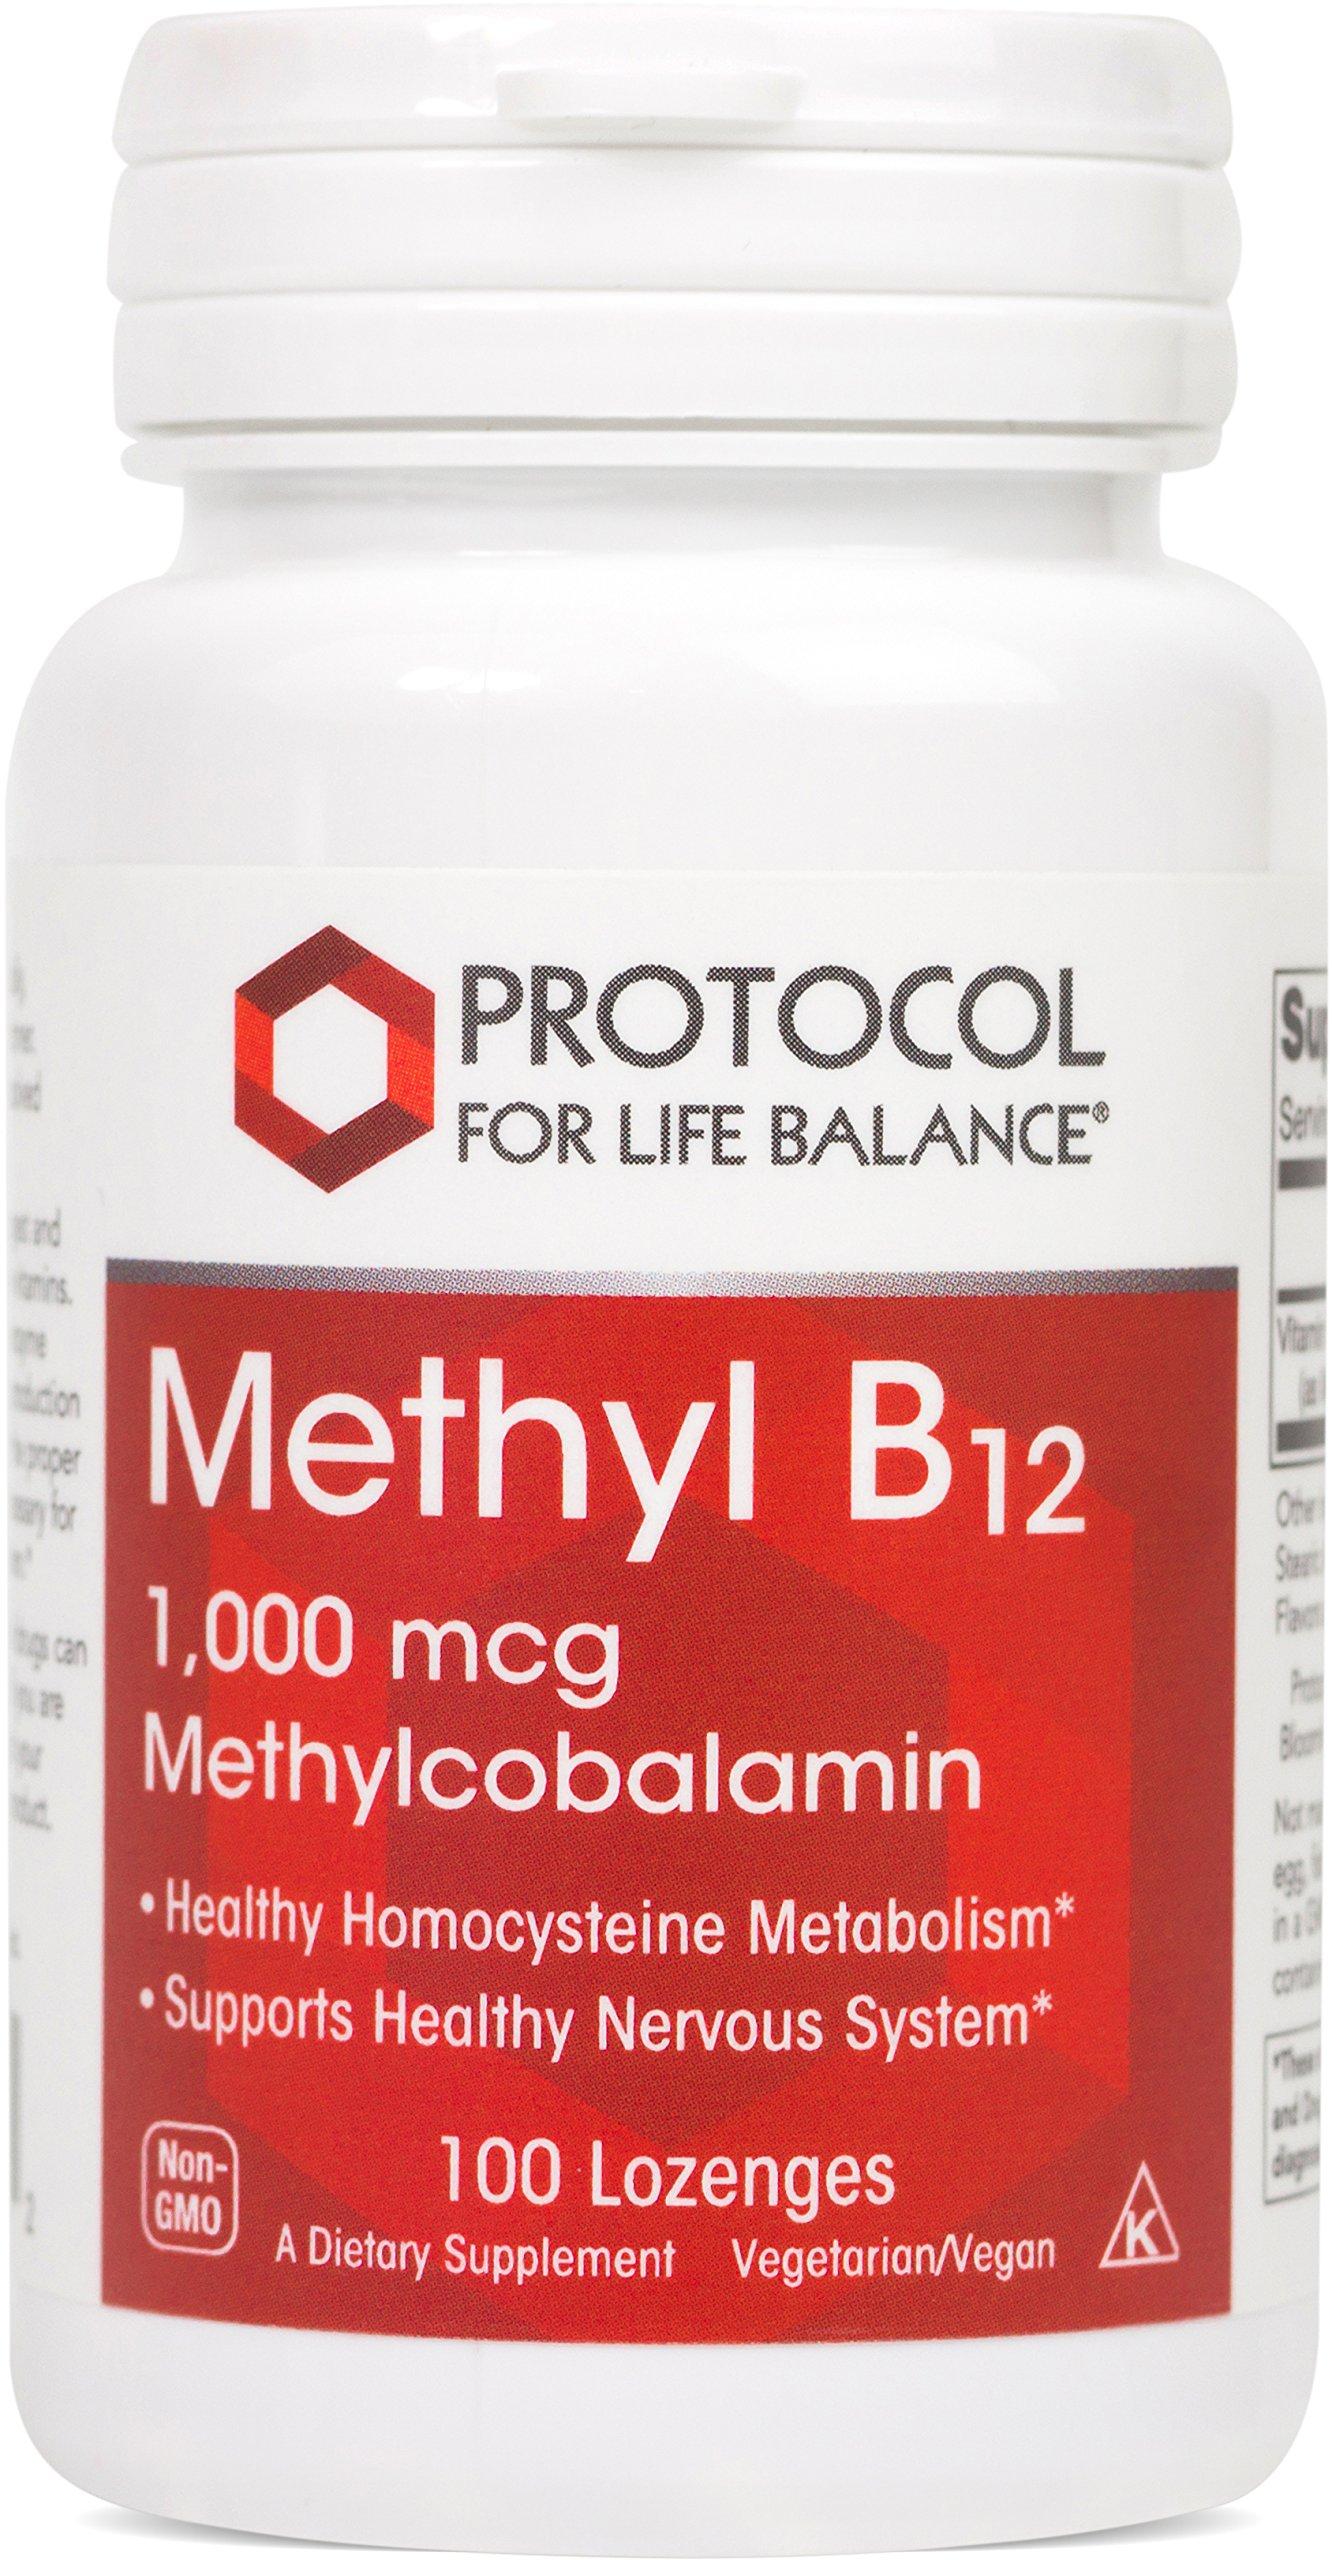 methylfolate 15 by methyl life l 5 mthf or. Black Bedroom Furniture Sets. Home Design Ideas